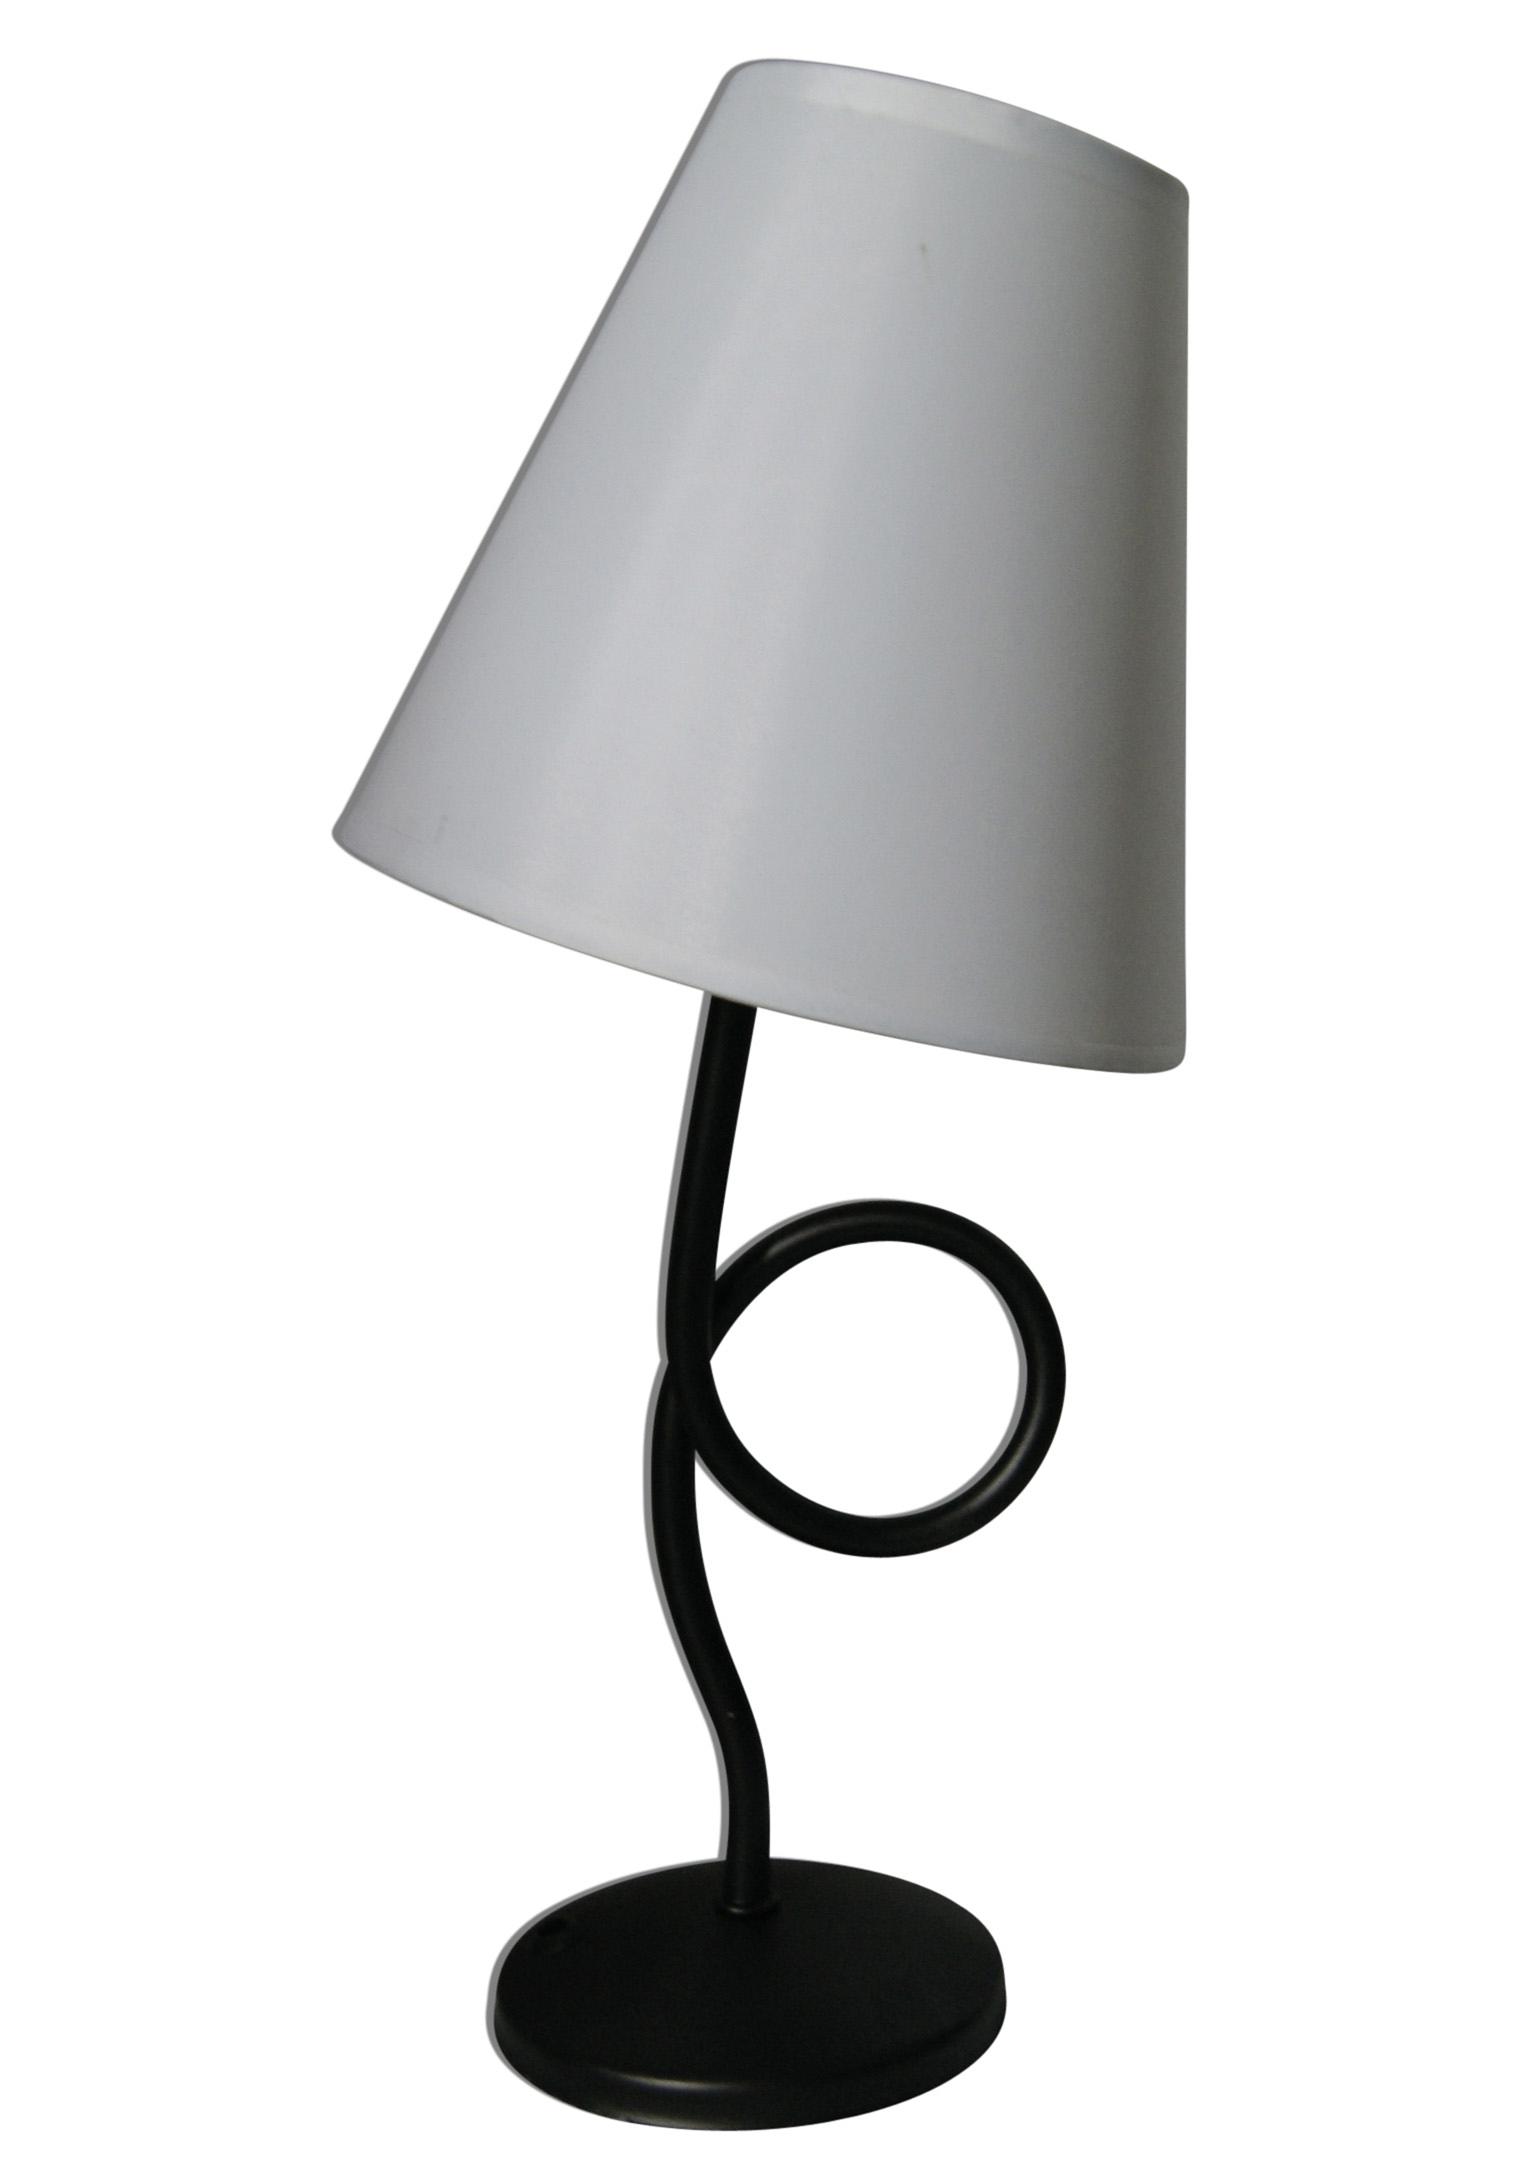 näve NÄVE Tafellamp met 1 fitting - verschillende betaalmethodes